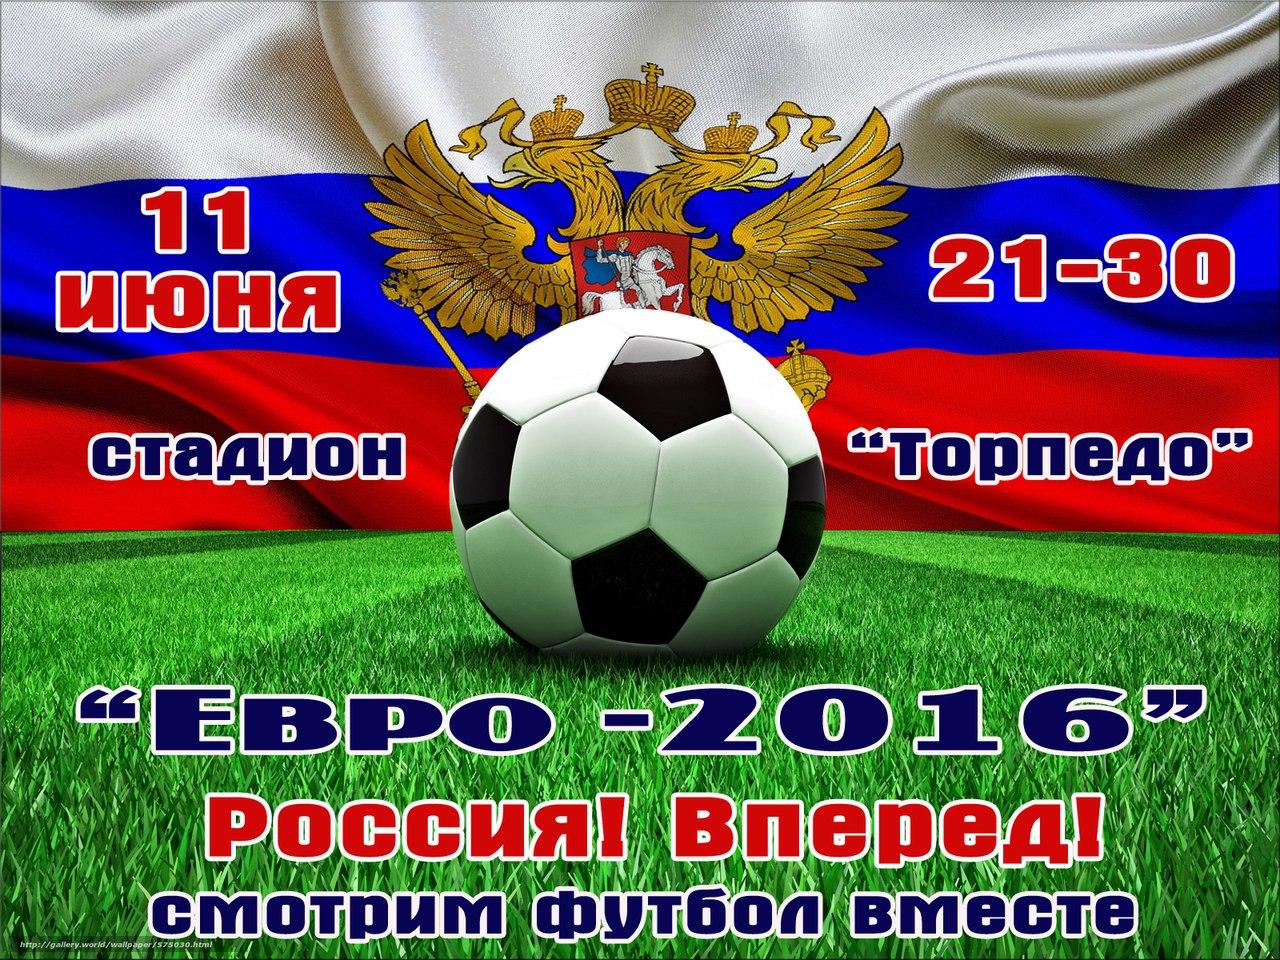 Просмотр матча Россия - Англия